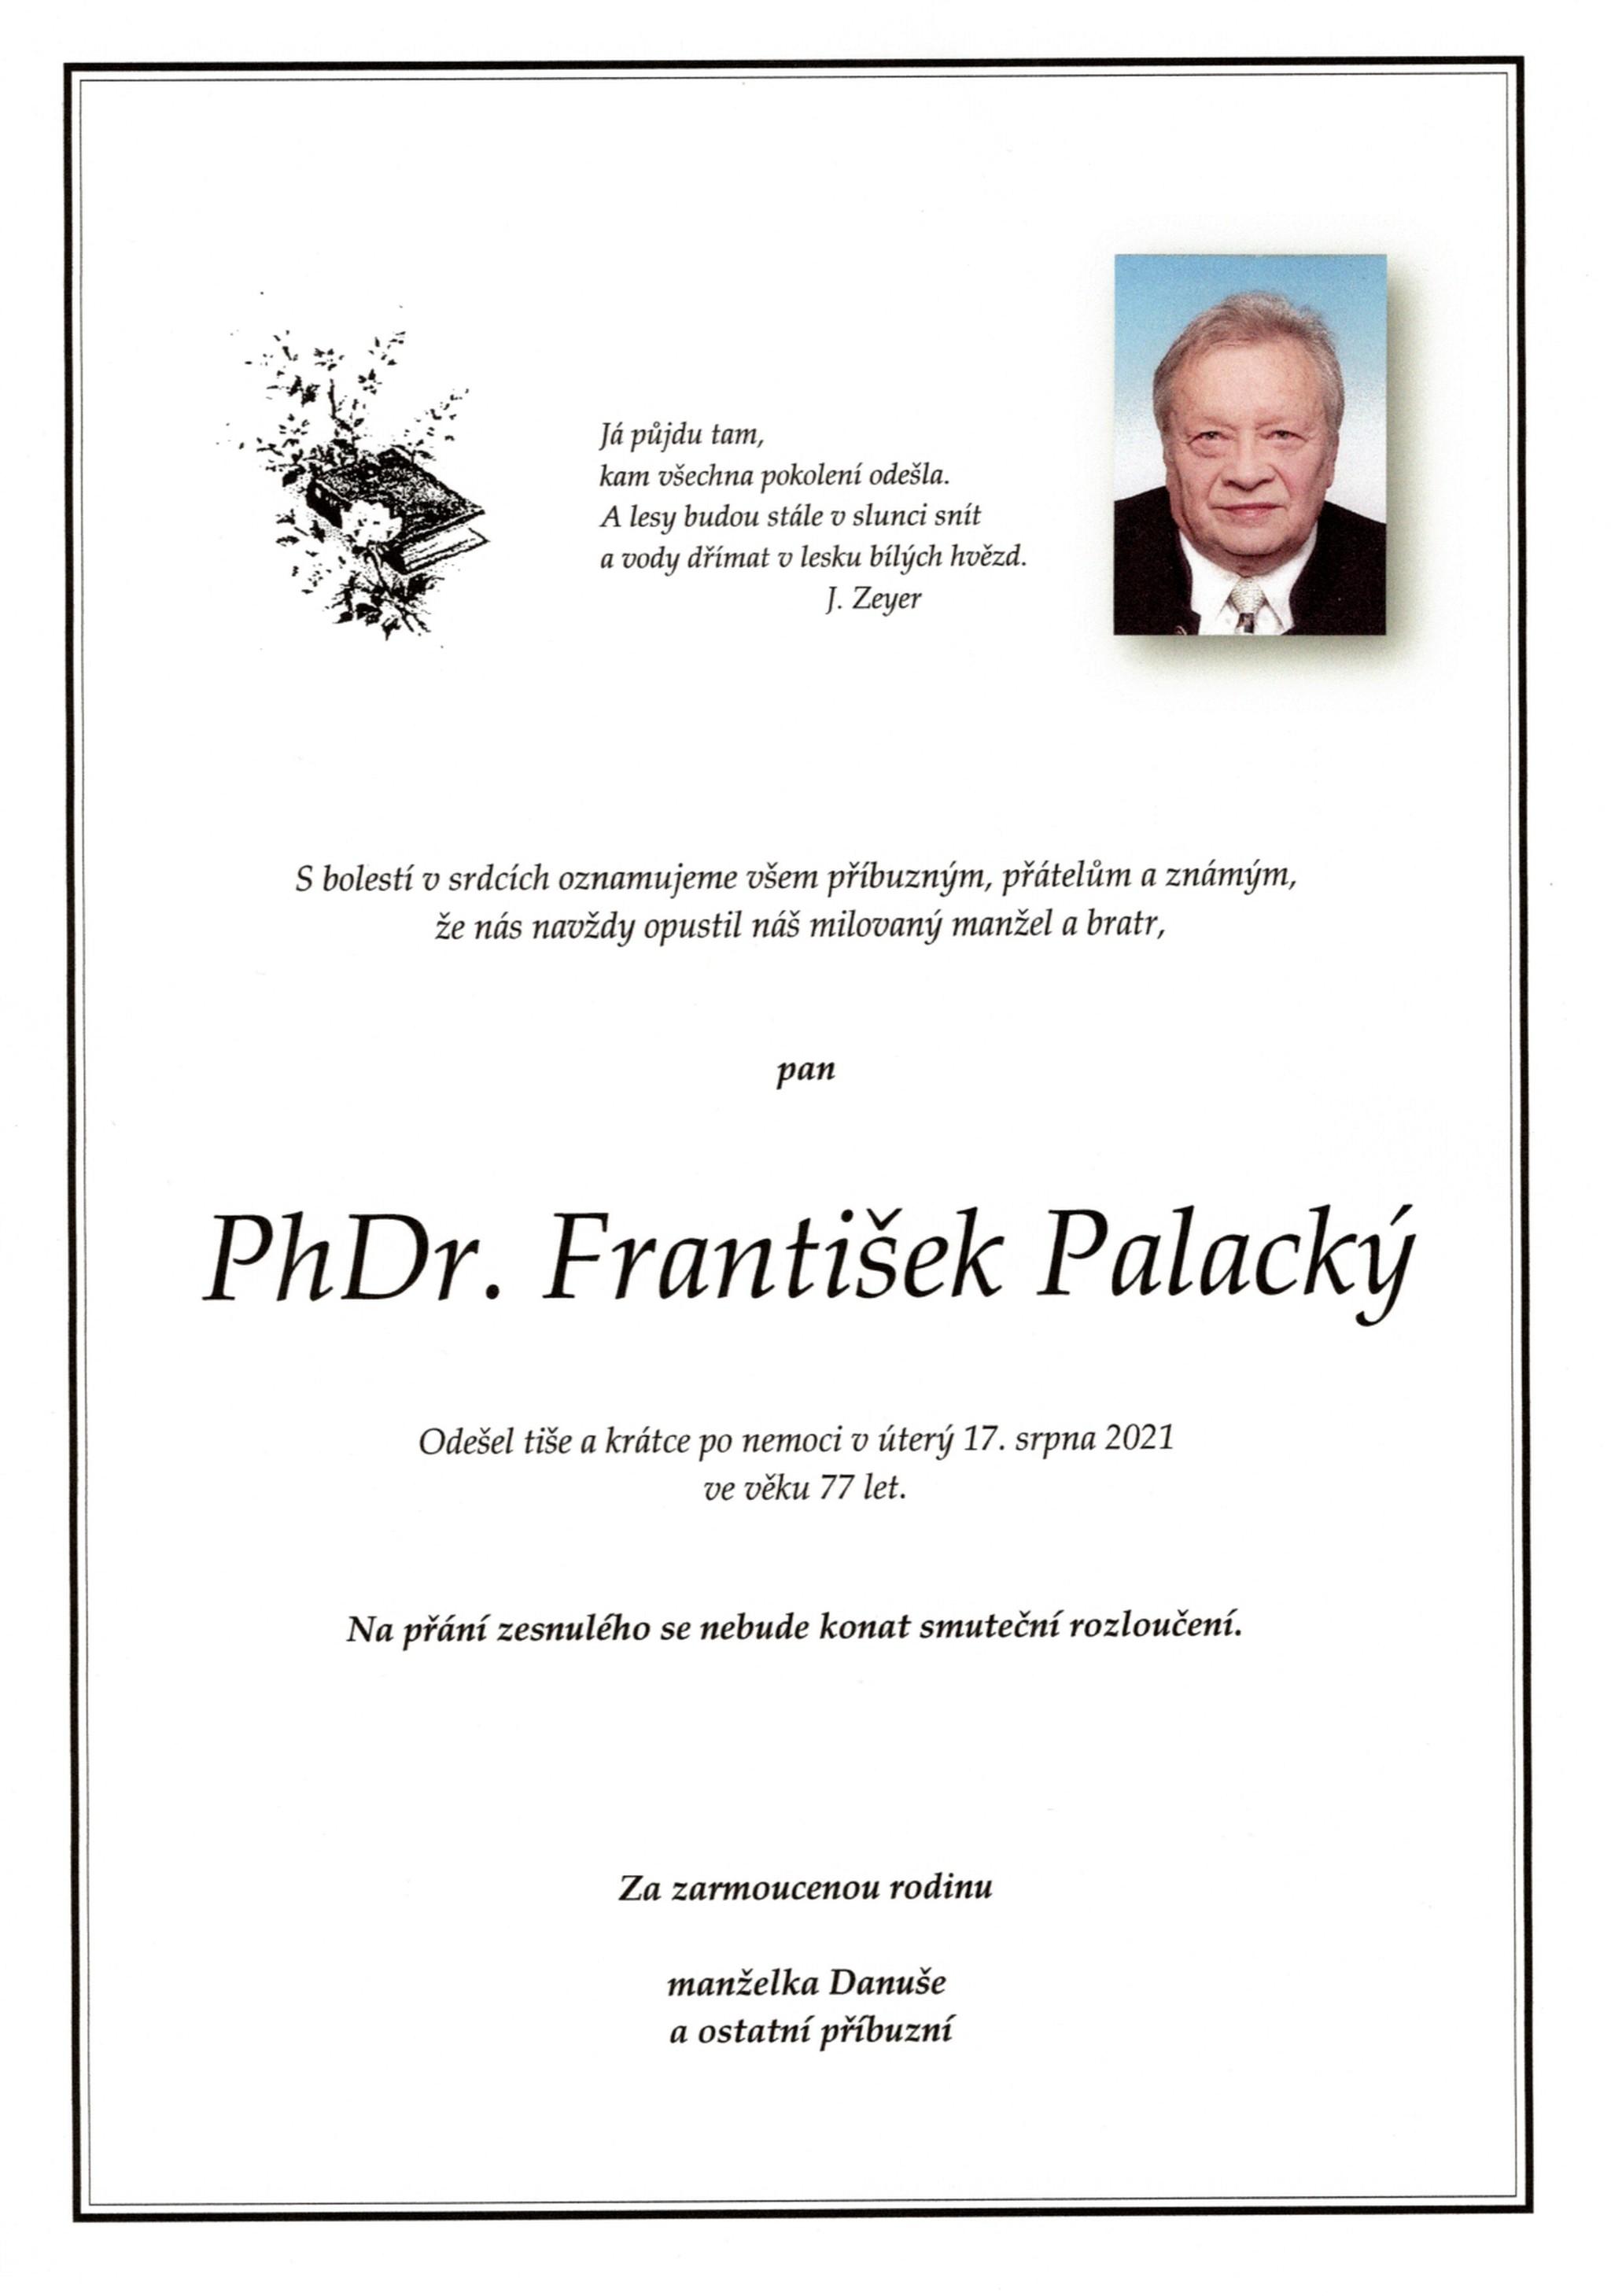 PhDr. František Palacký